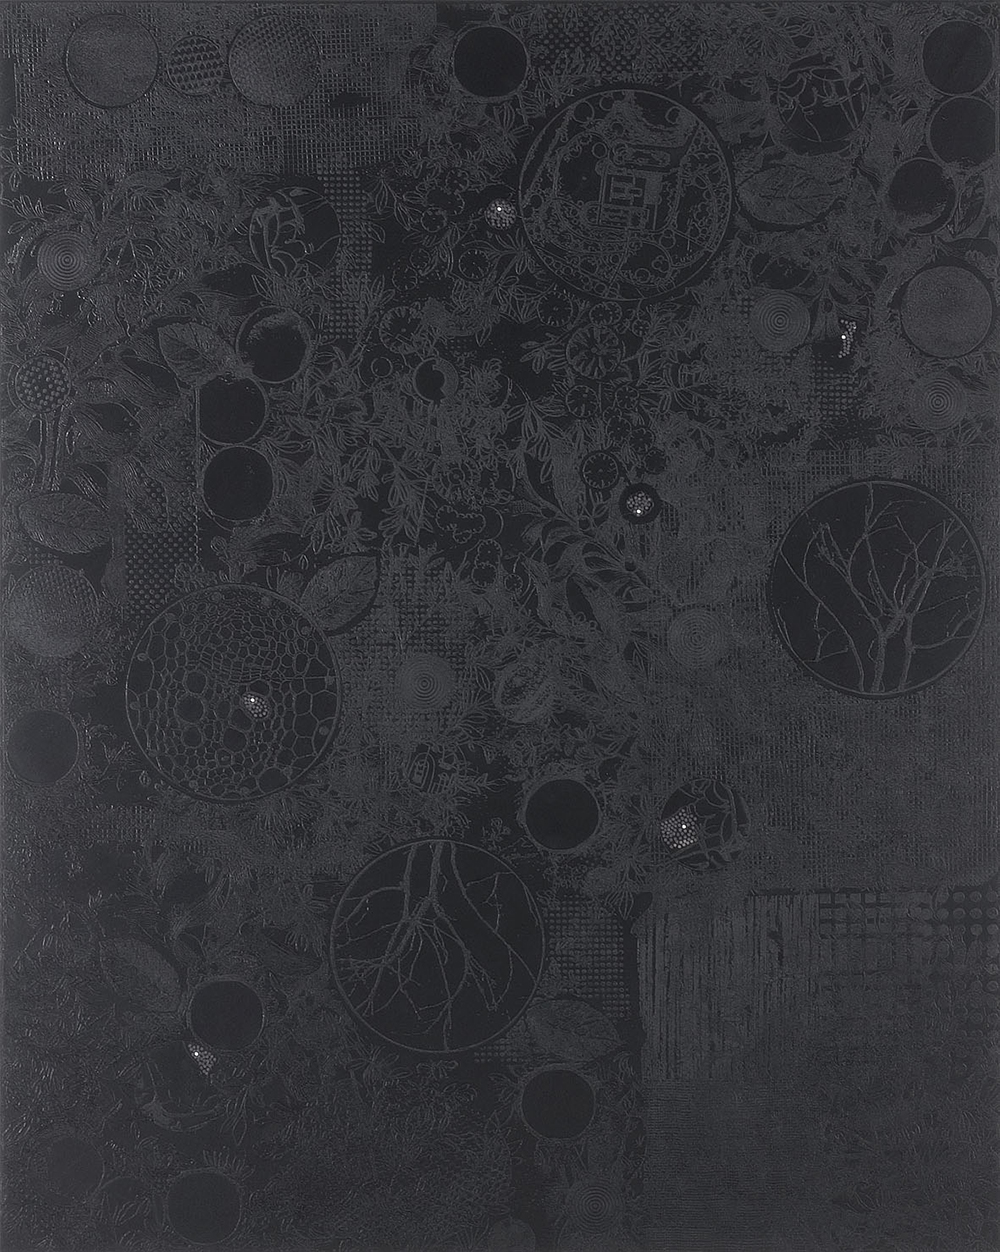 Nero ombrato, 2005, olio su tela, cm 250x200